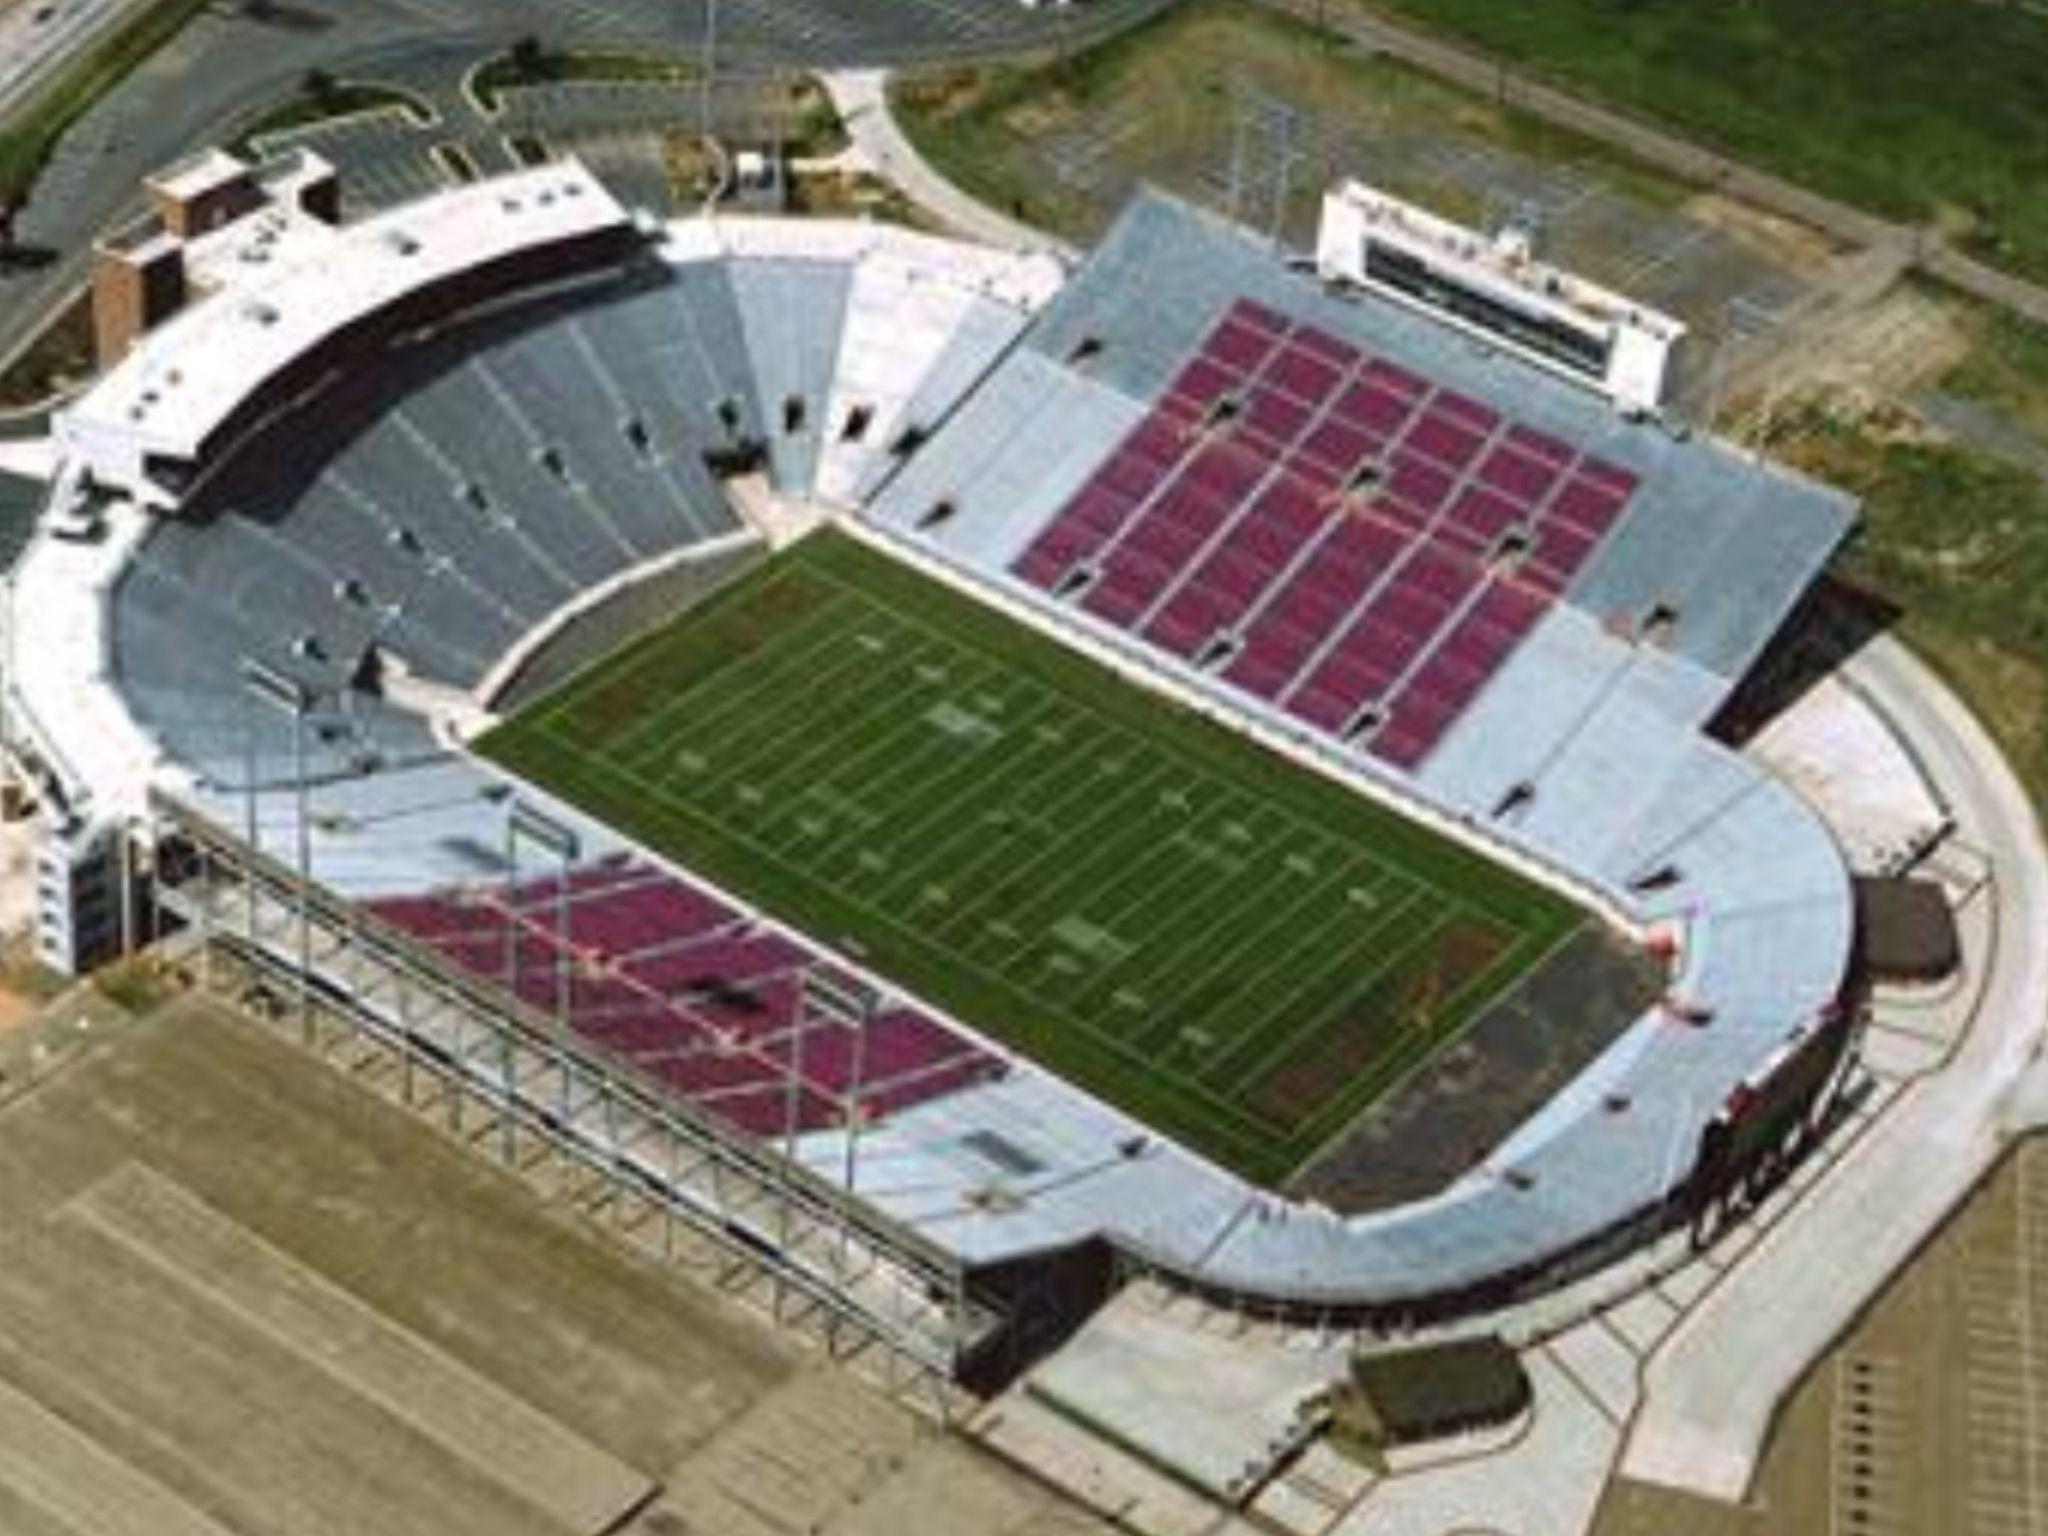 Independence Stadium, Shreveport LA. It has been renovated